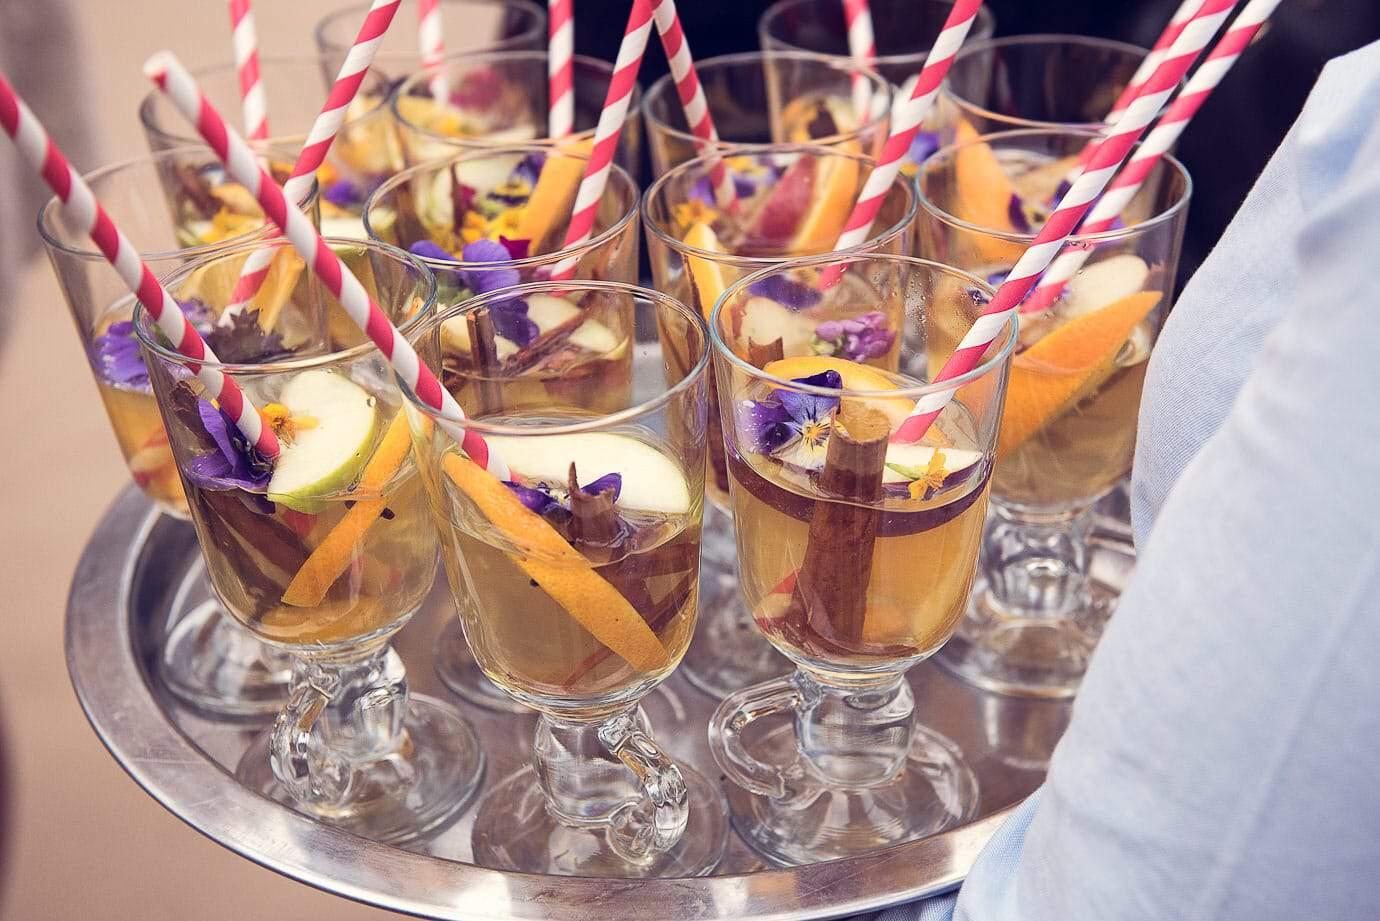 Spiced Christmas drinks at Plush Manor wedding drinks reception